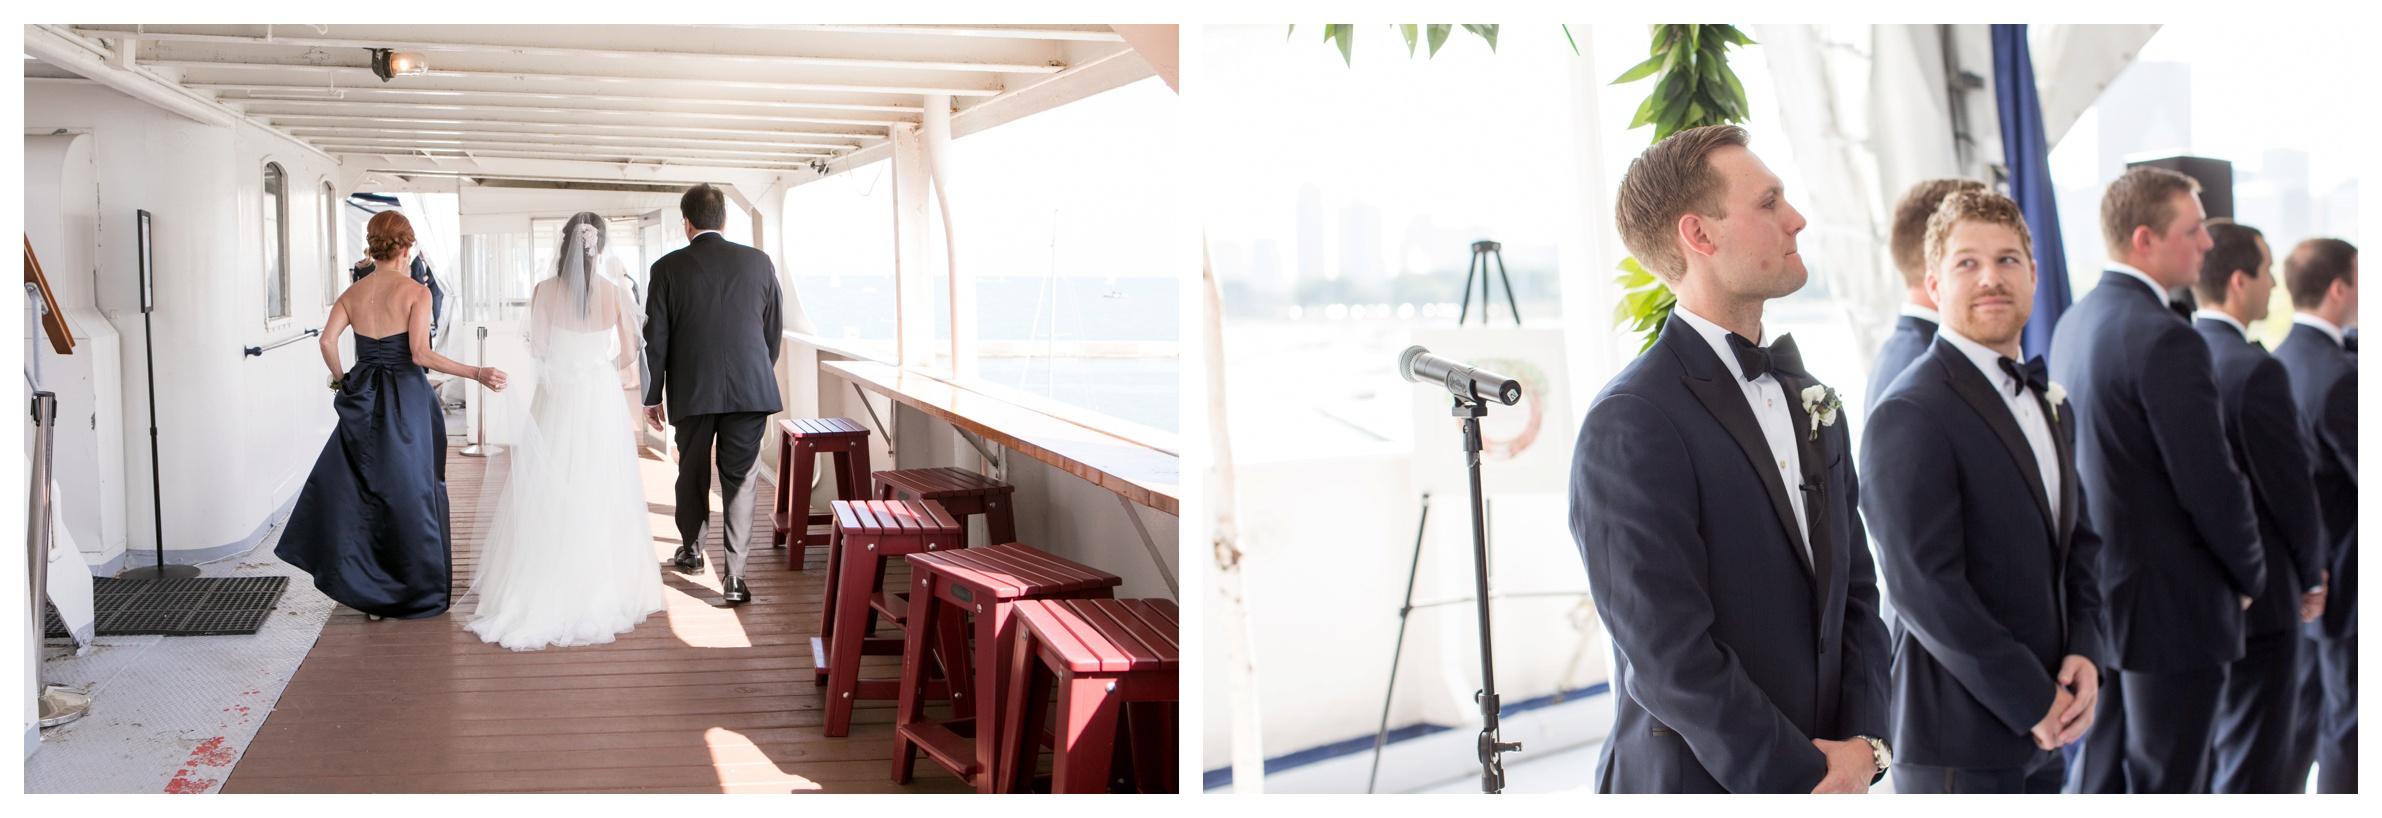 columbia-yacht-club-chicago-wedding_0015.jpg